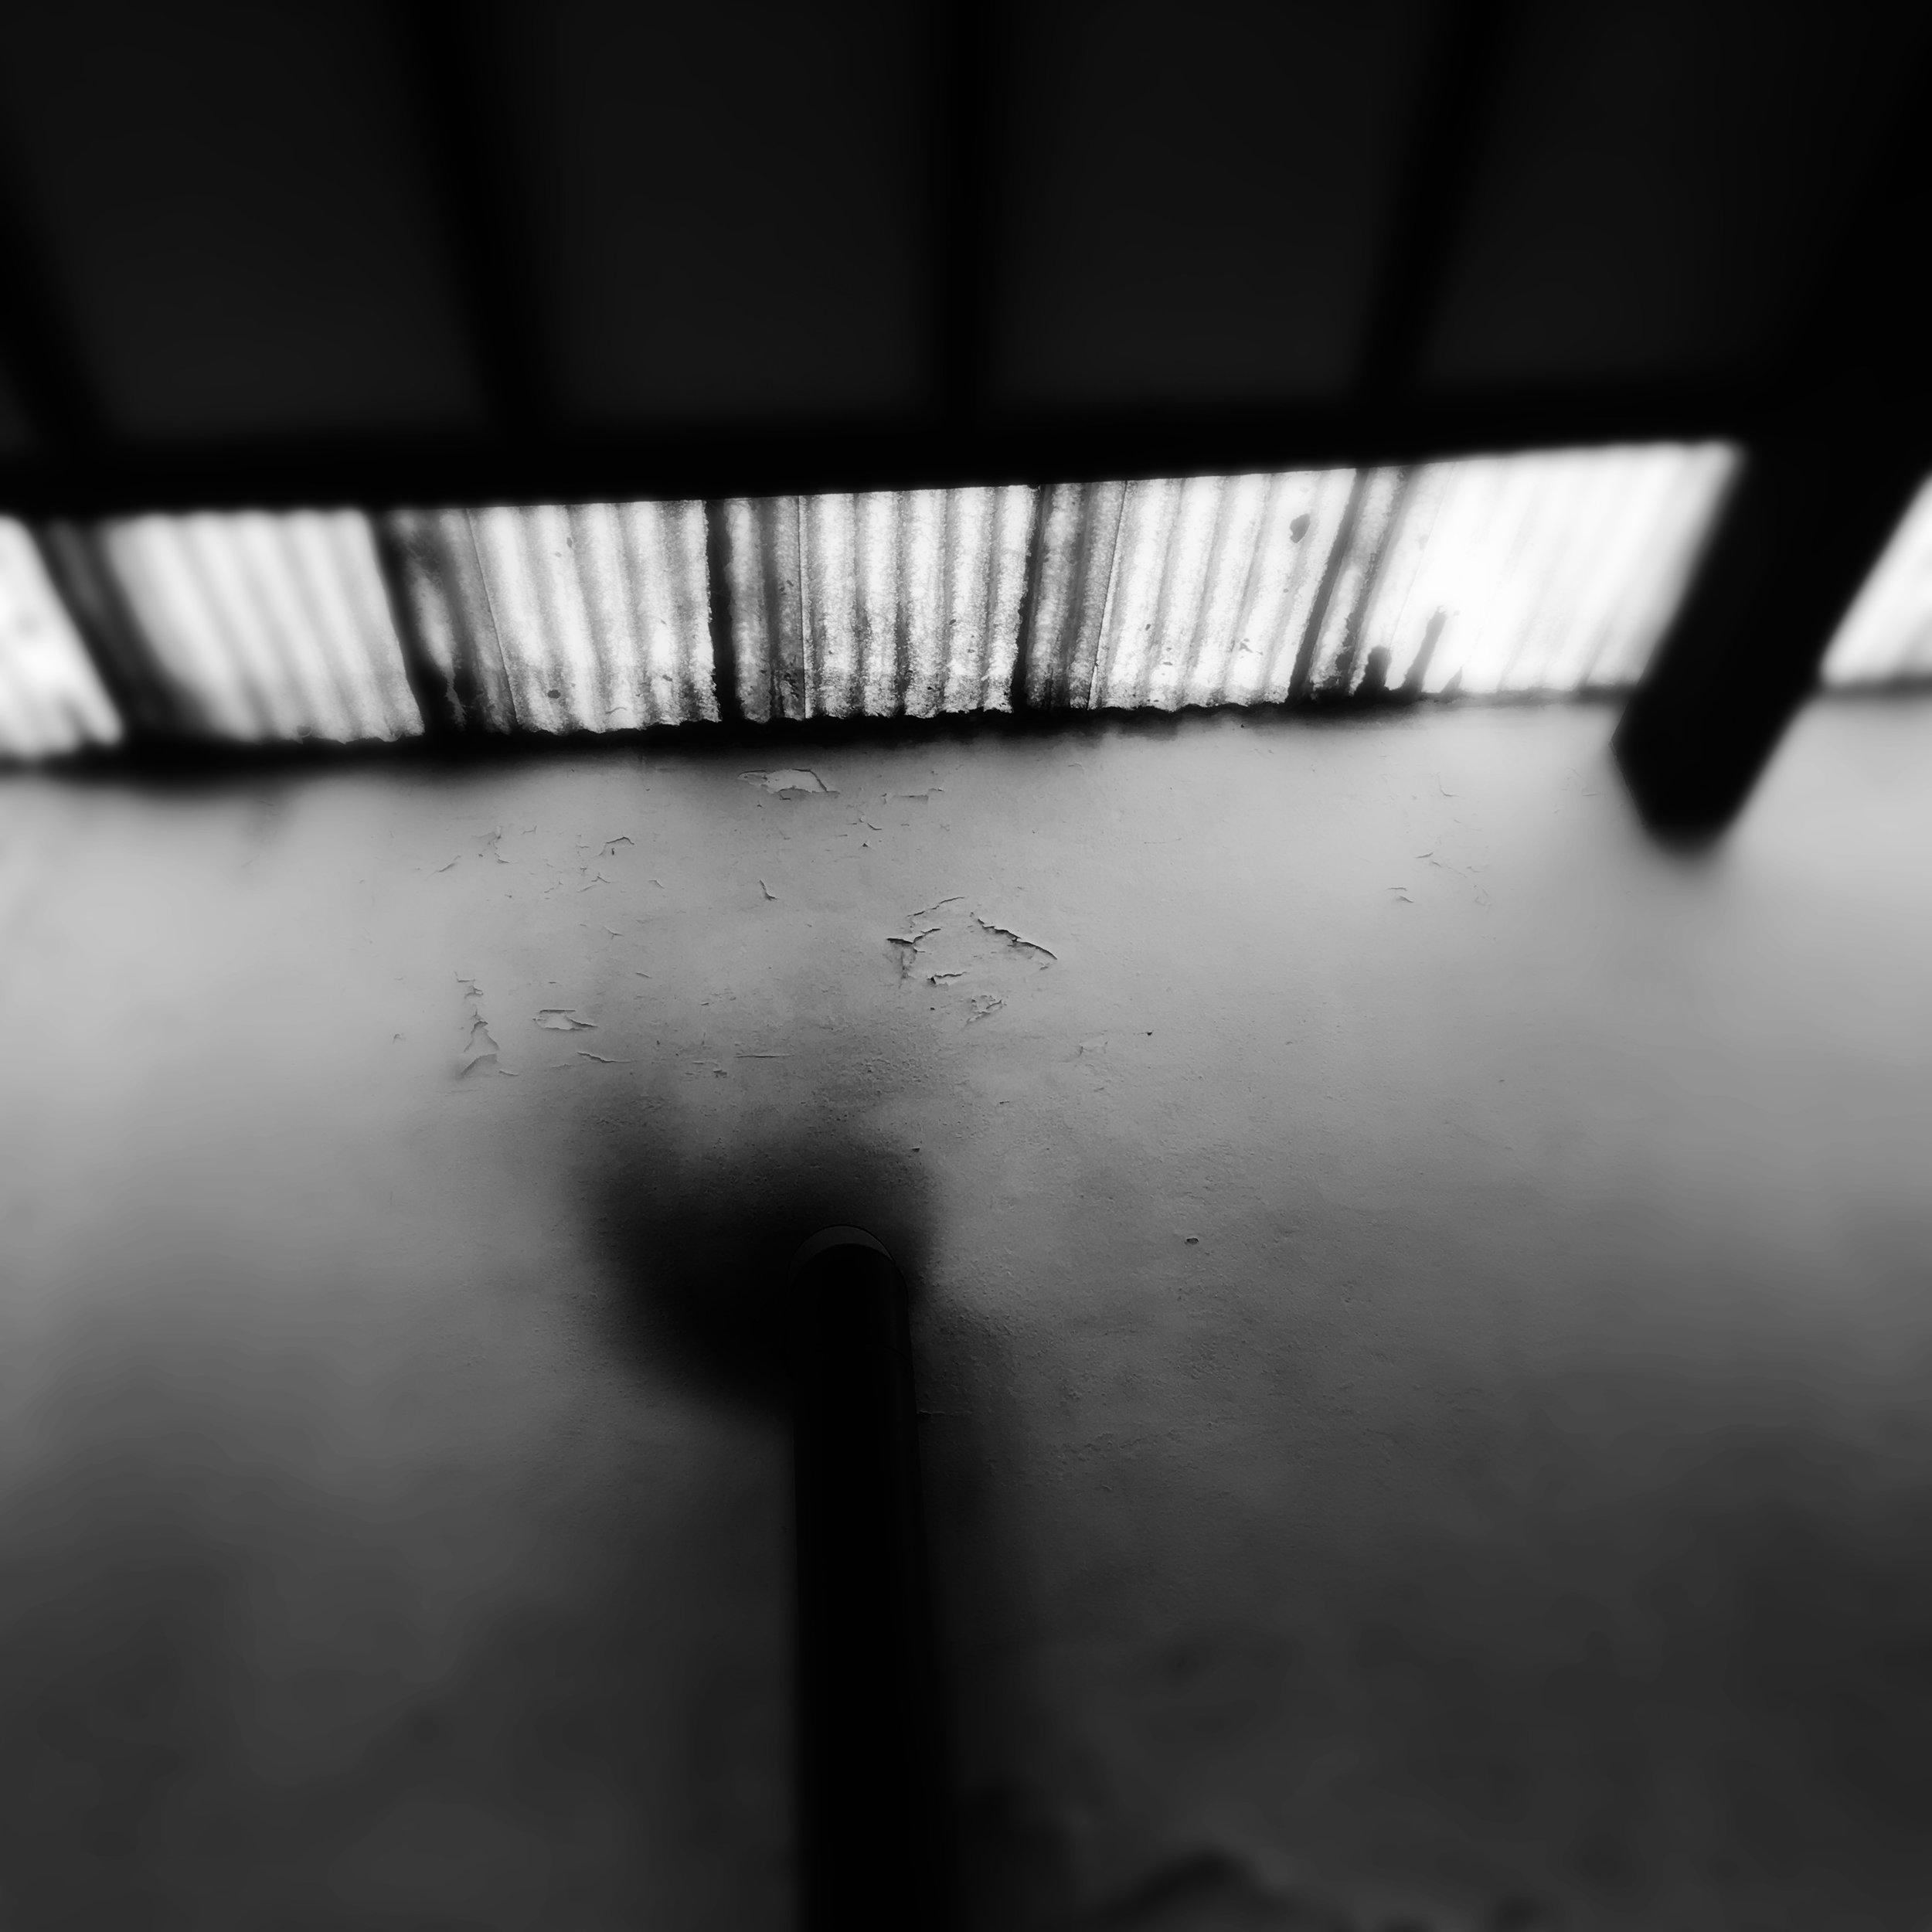 HipstamaticPhoto-521567655.005684.jpg